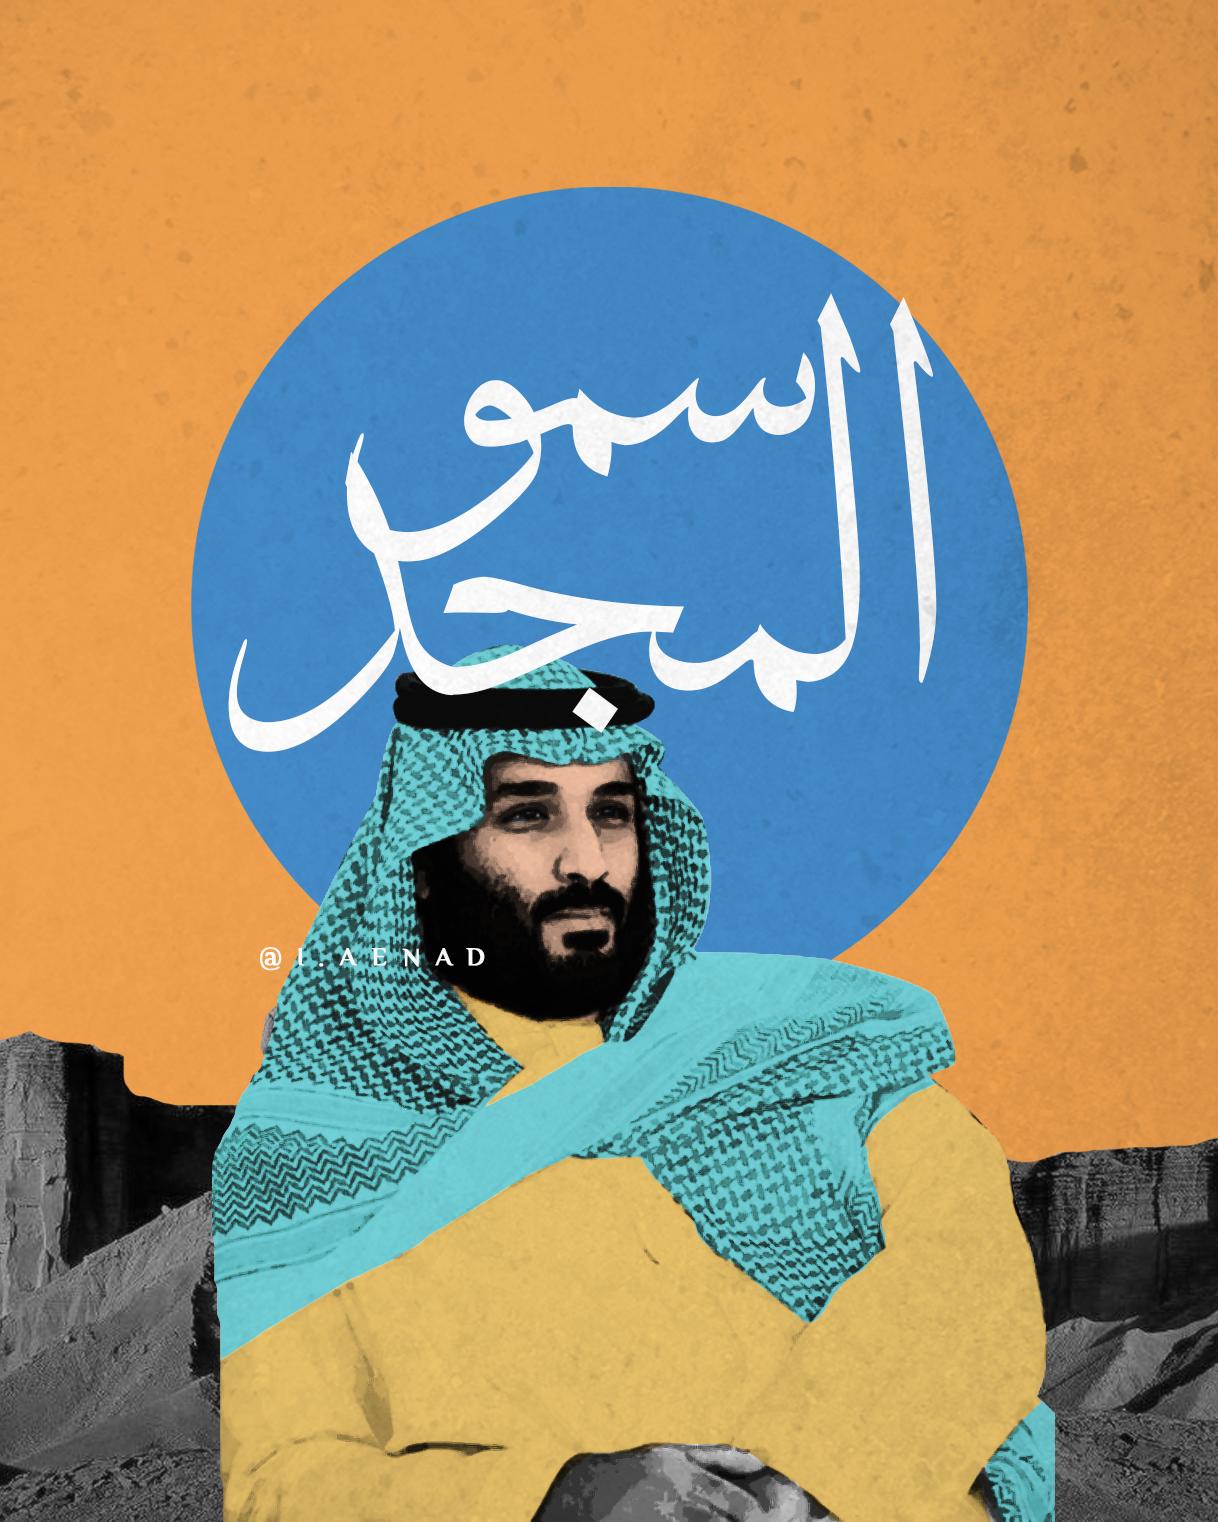 ولي العهد محمد بن سلمان Drawings Art Poster